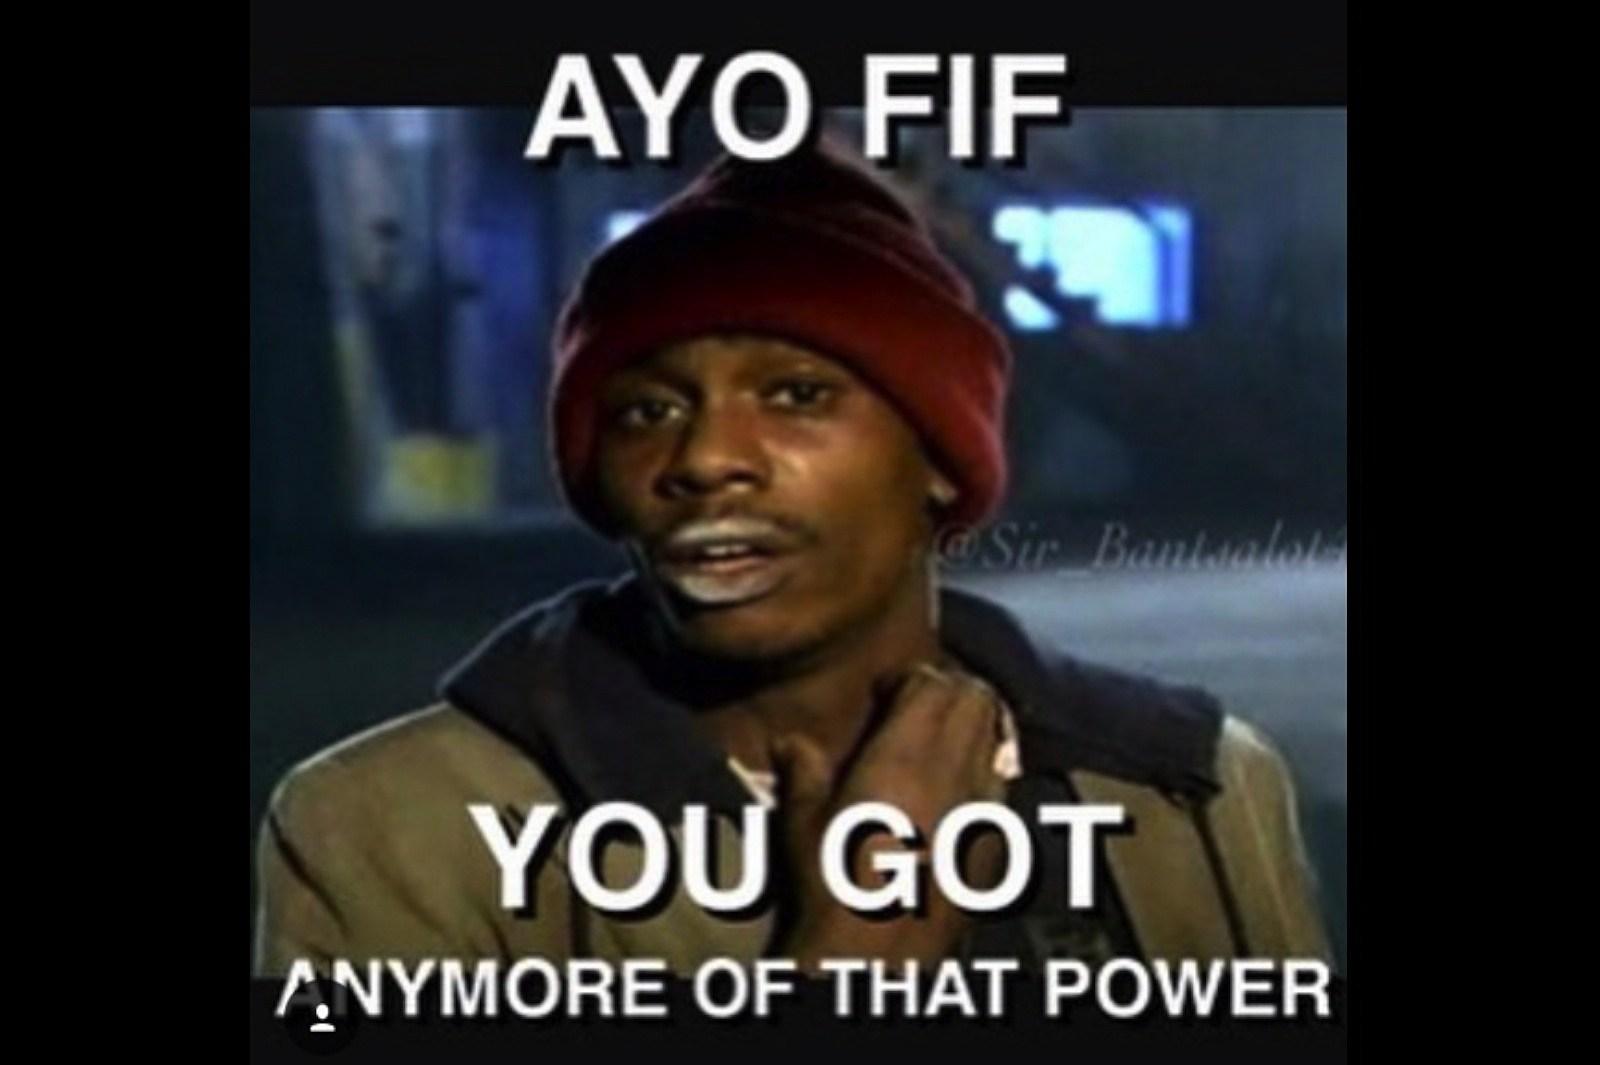 Power Meme 18 20 hilarious memes from 'power' season 3 finale xxl